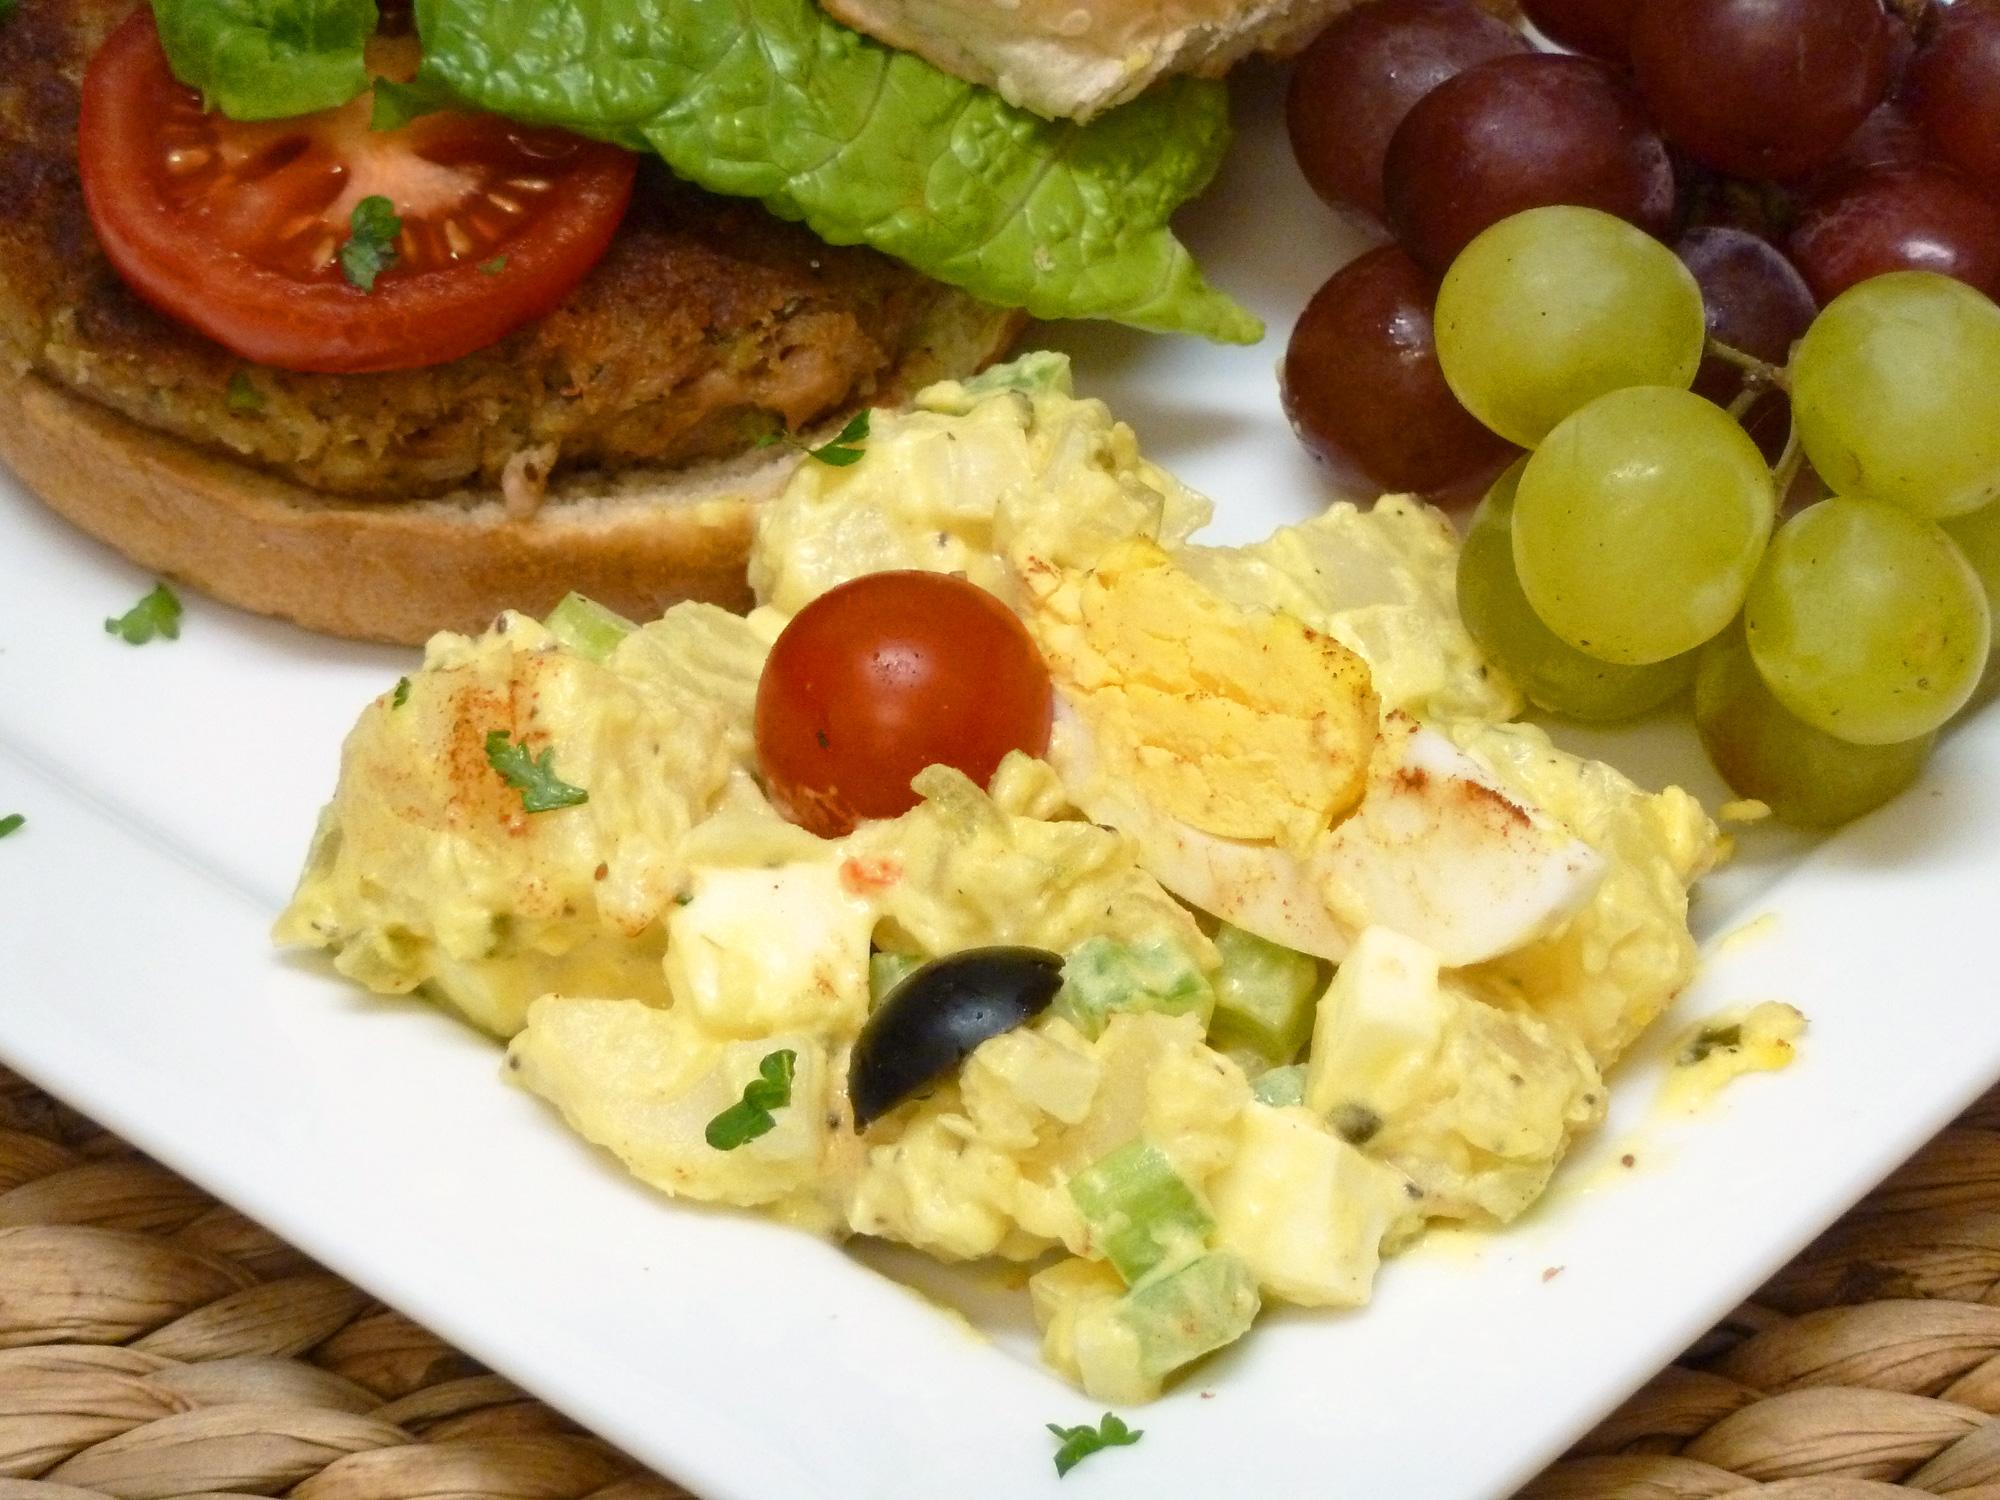 Grandma's Southern Potato Salad Recipe